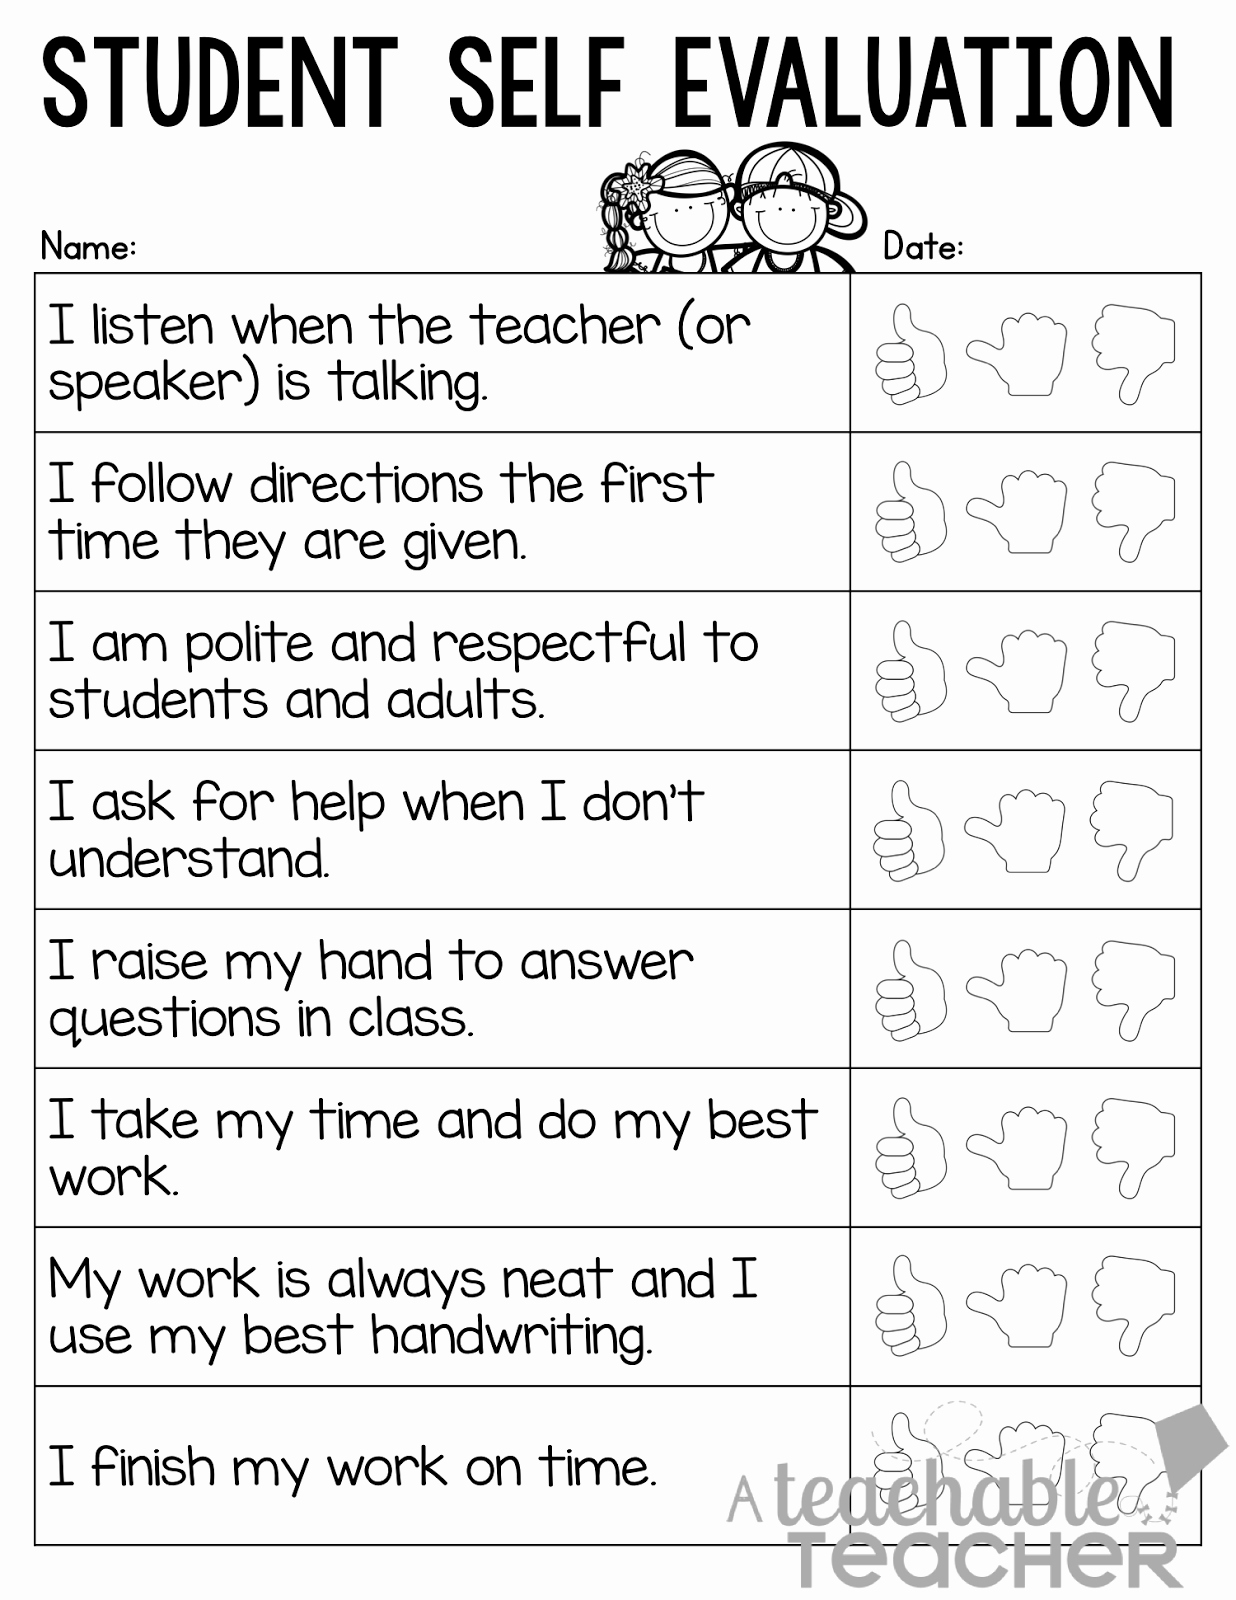 Printable Teacher Evaluation form New Parent Teacher Conference Tips and Freebies Linky Party A Teachable Teacher